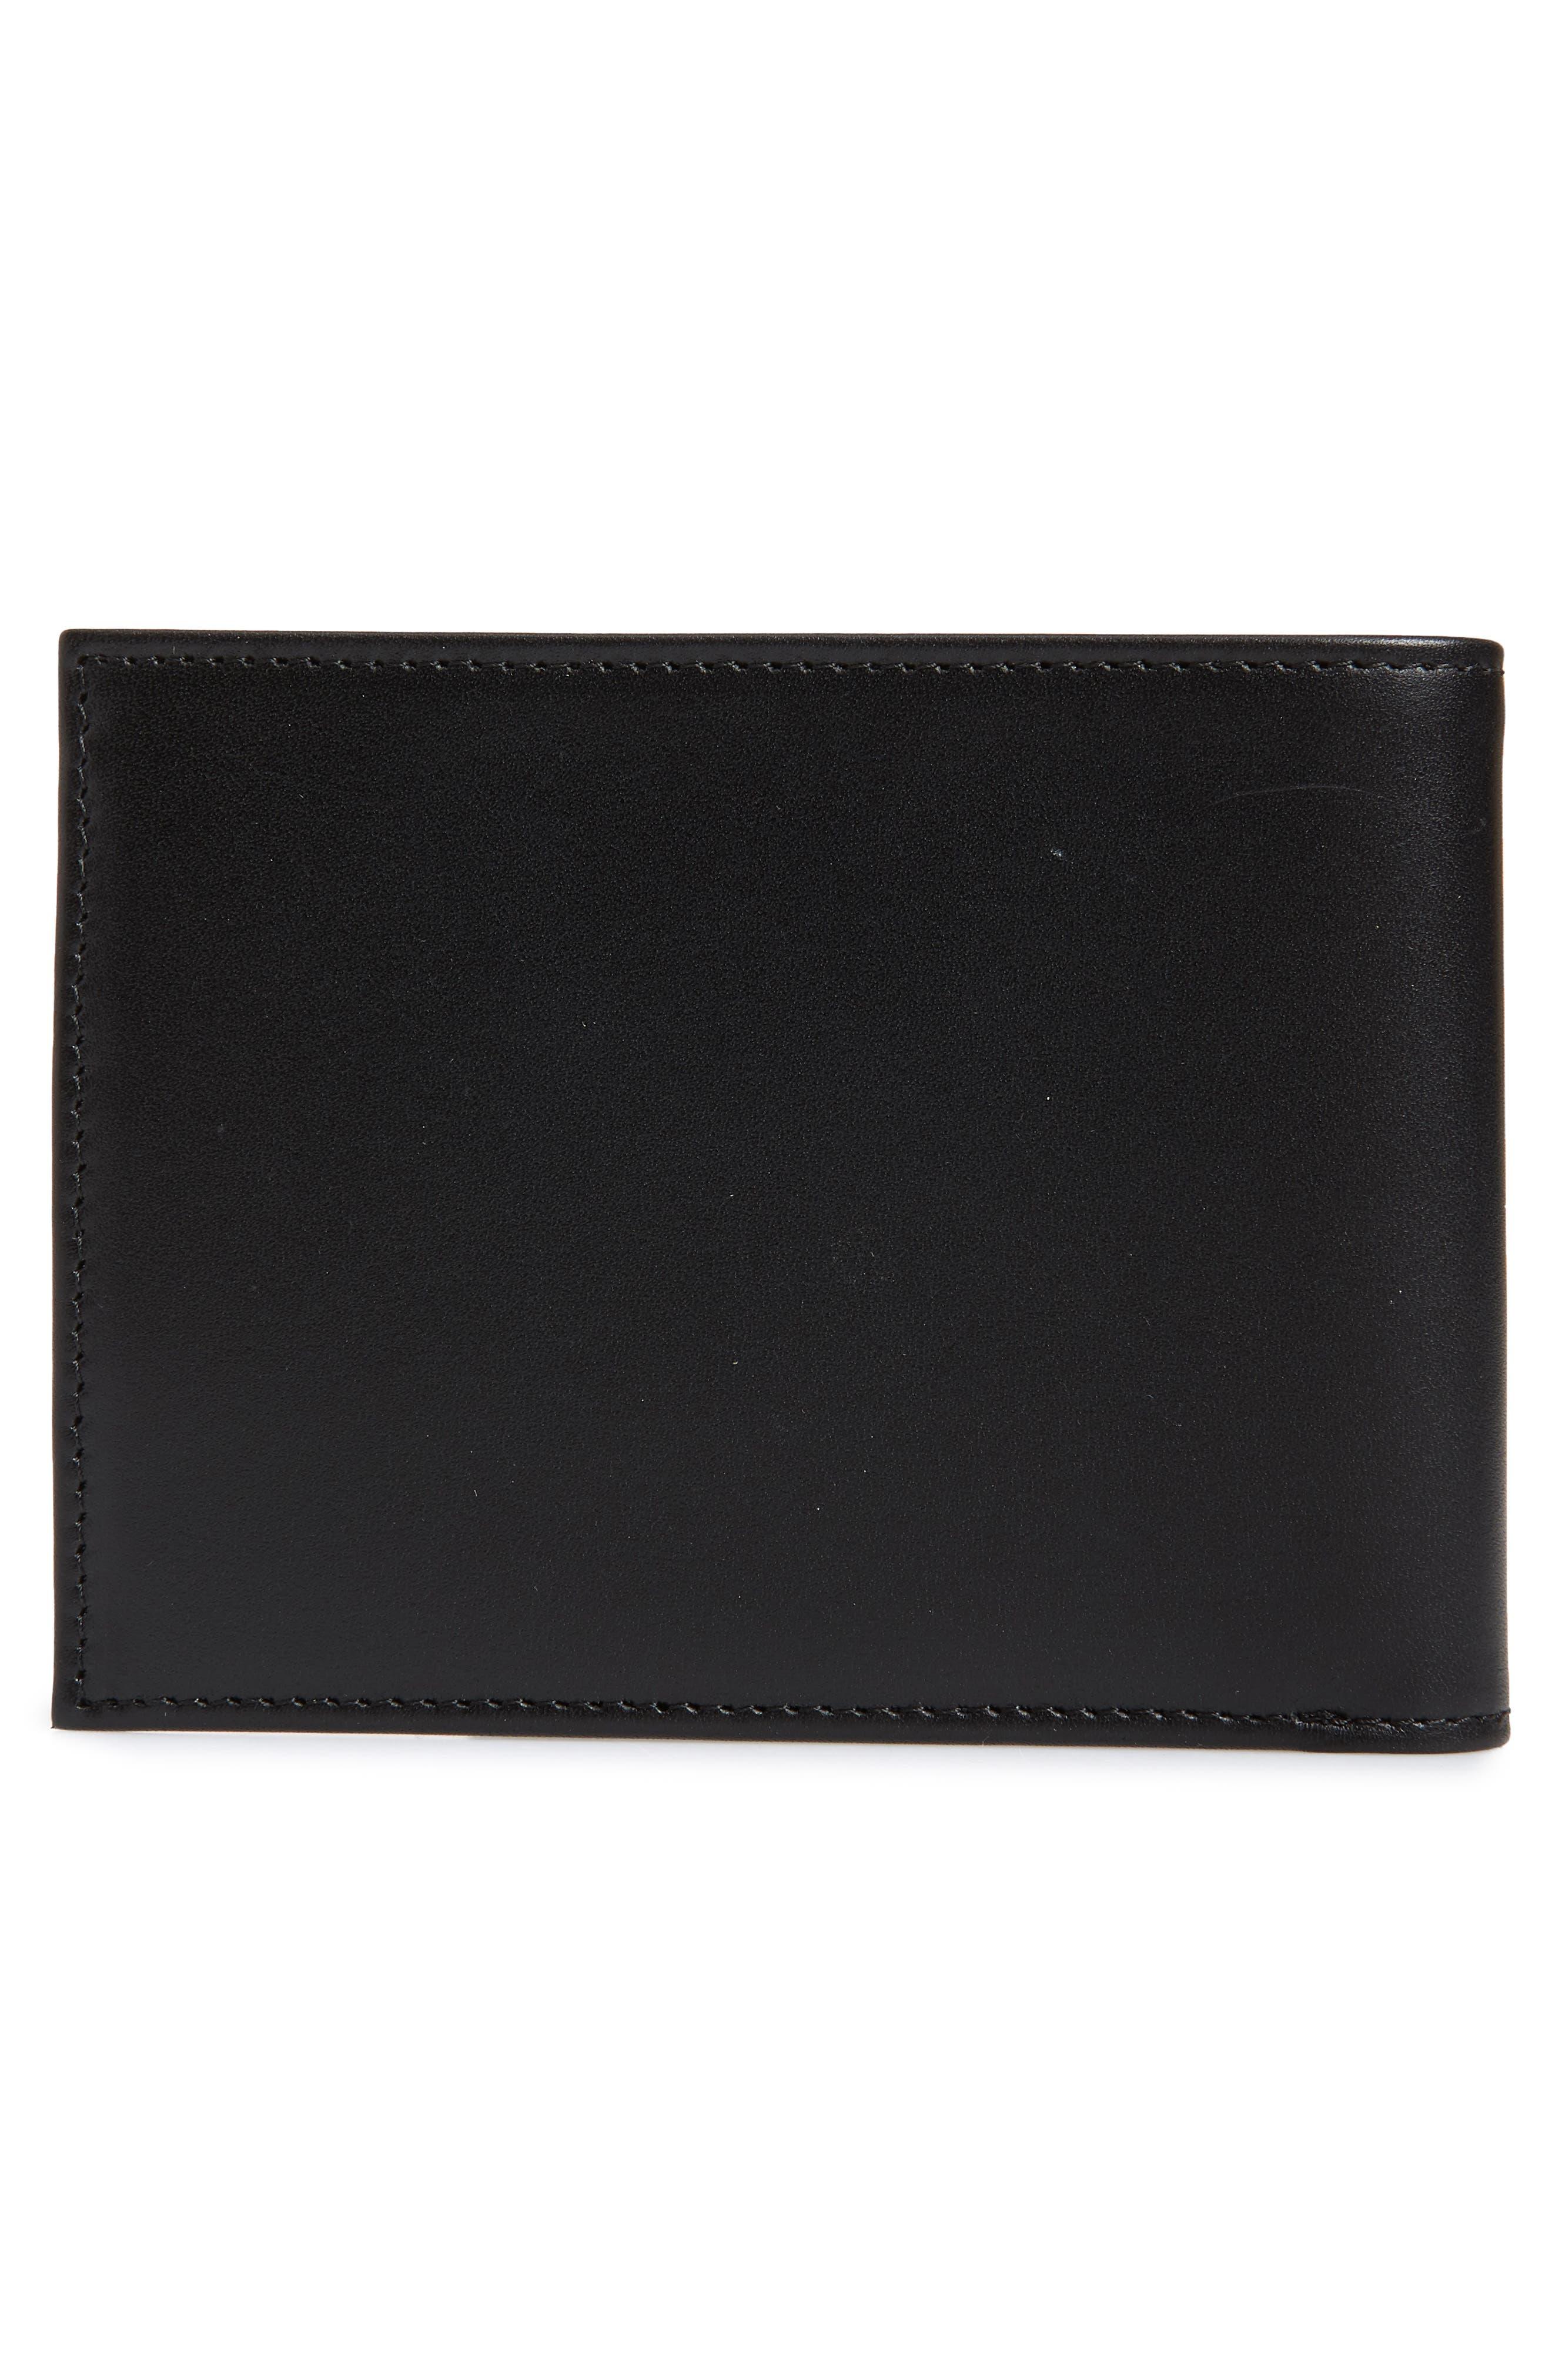 NORDSTROM MEN'S SHOP, Chelsea Leather Wallet, Alternate thumbnail 3, color, BLACK